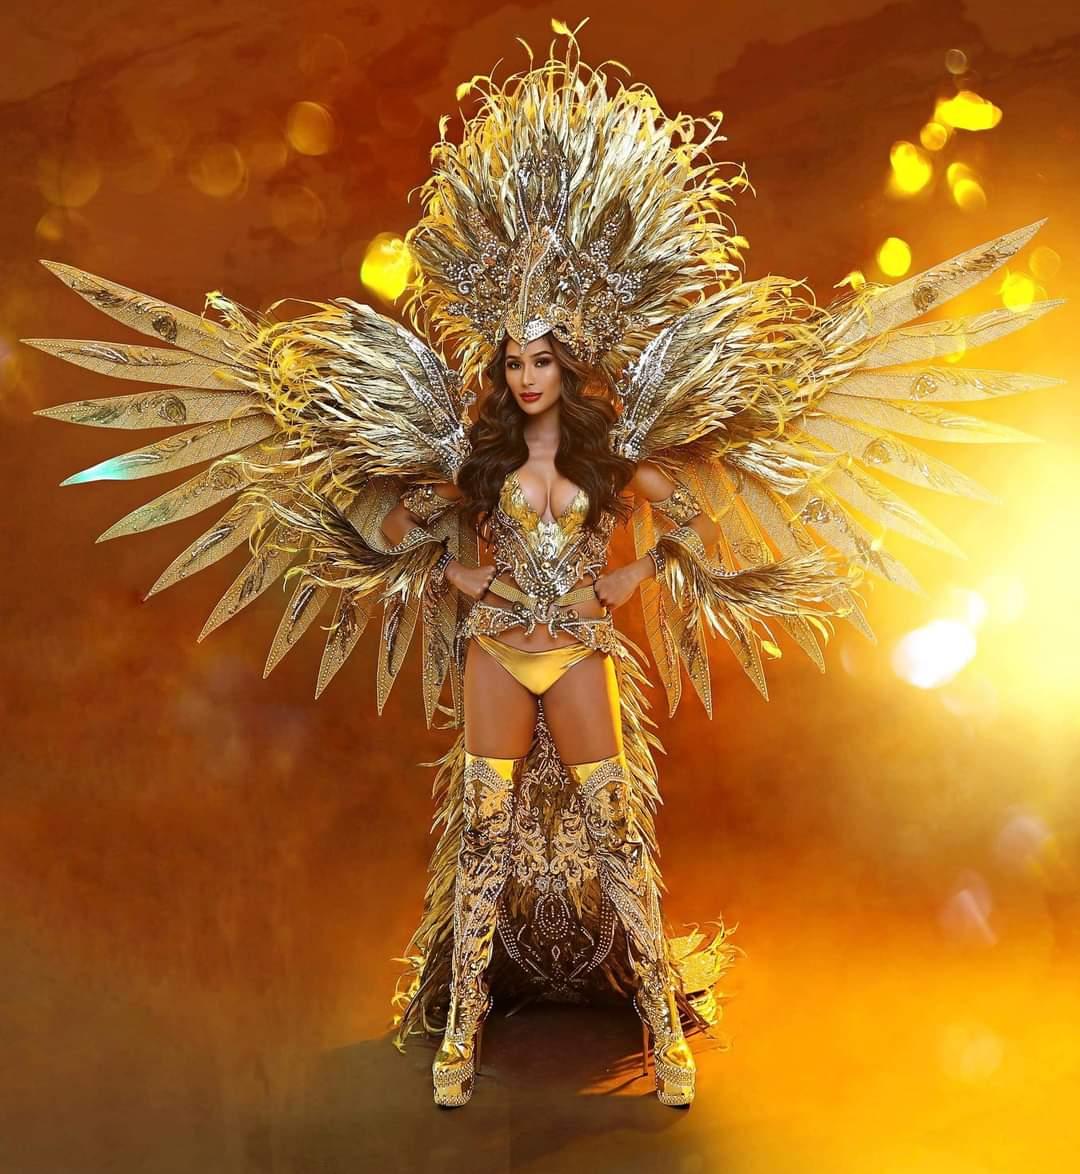 Samantha Bernardo eagle-inspired costume